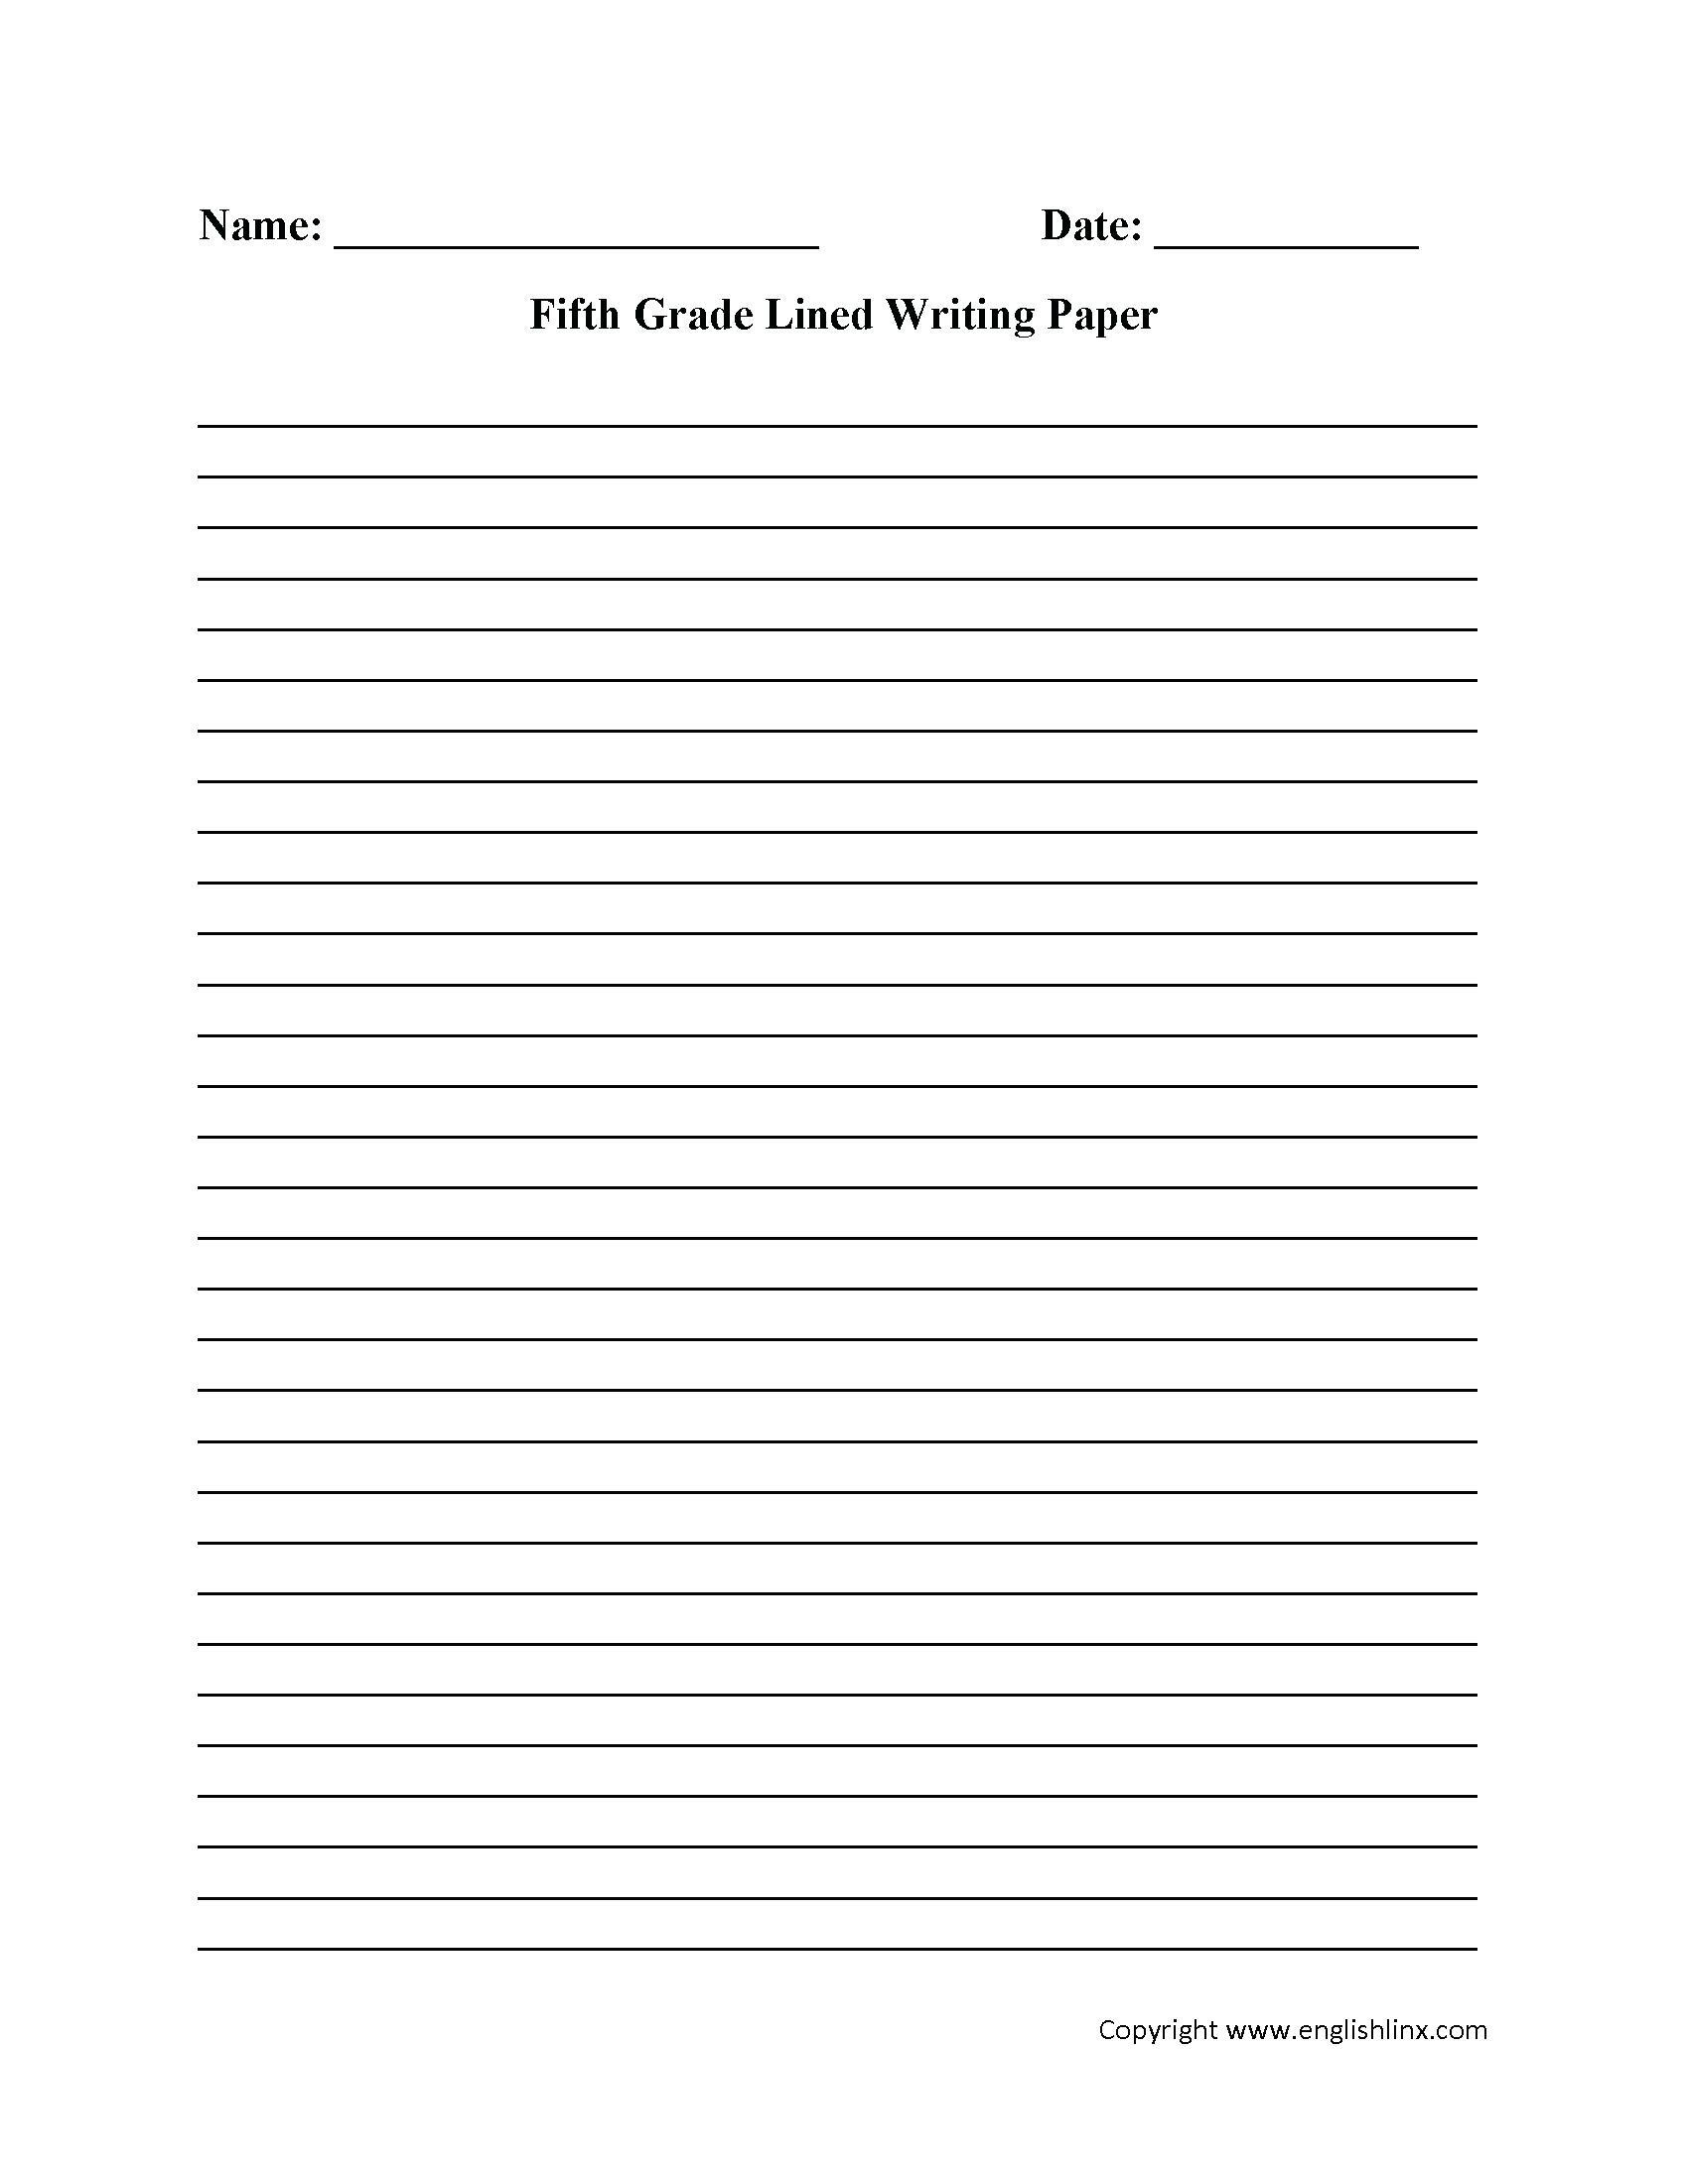 Cursive Handwriting Paper Free Cursive Writing Template Worksheet   Free Printable Handwriting Worksheets For First Grade